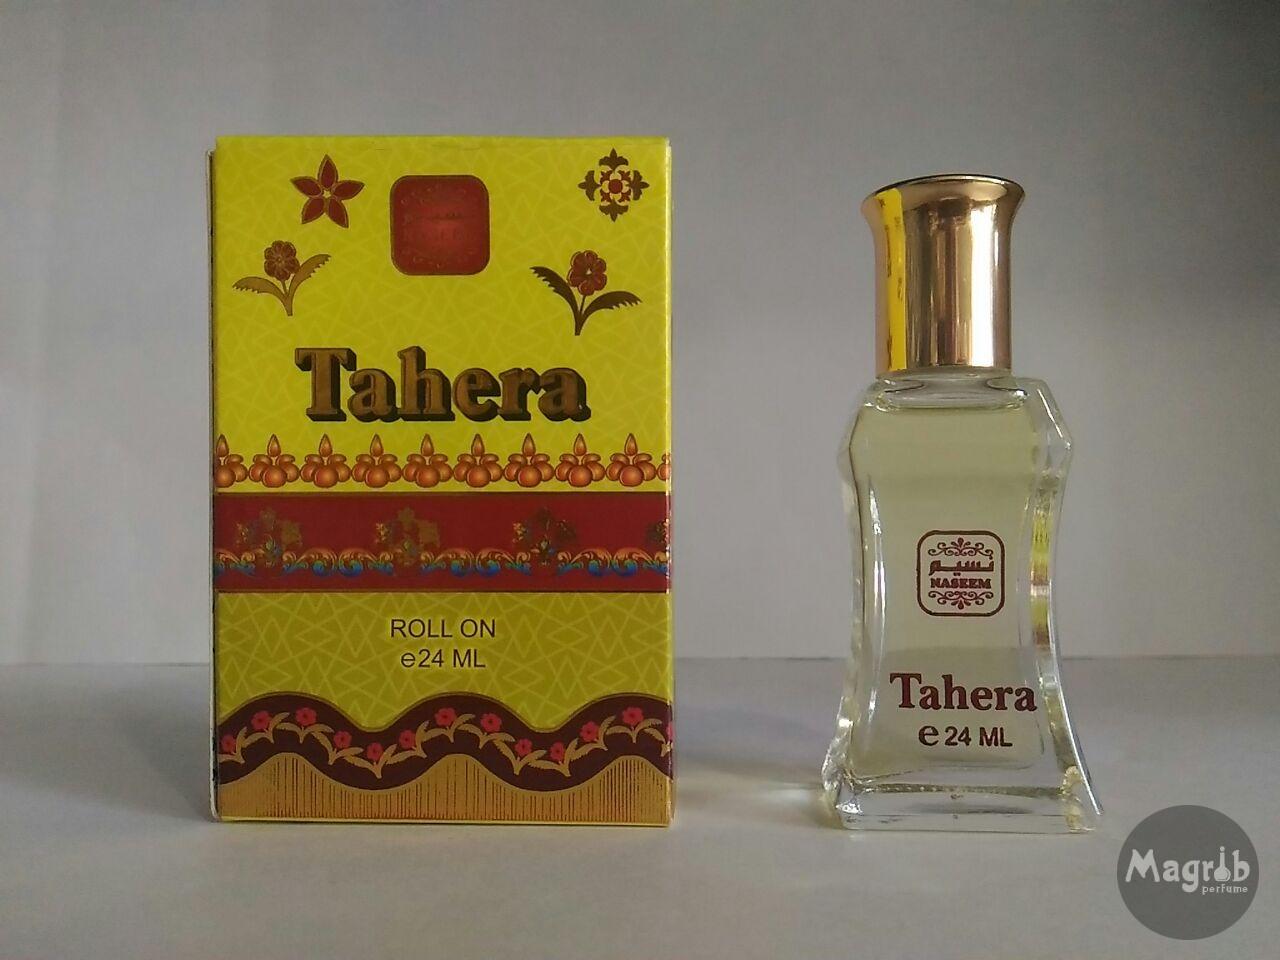 Naseem- Tahera 24ml- масляные духи, роллер.